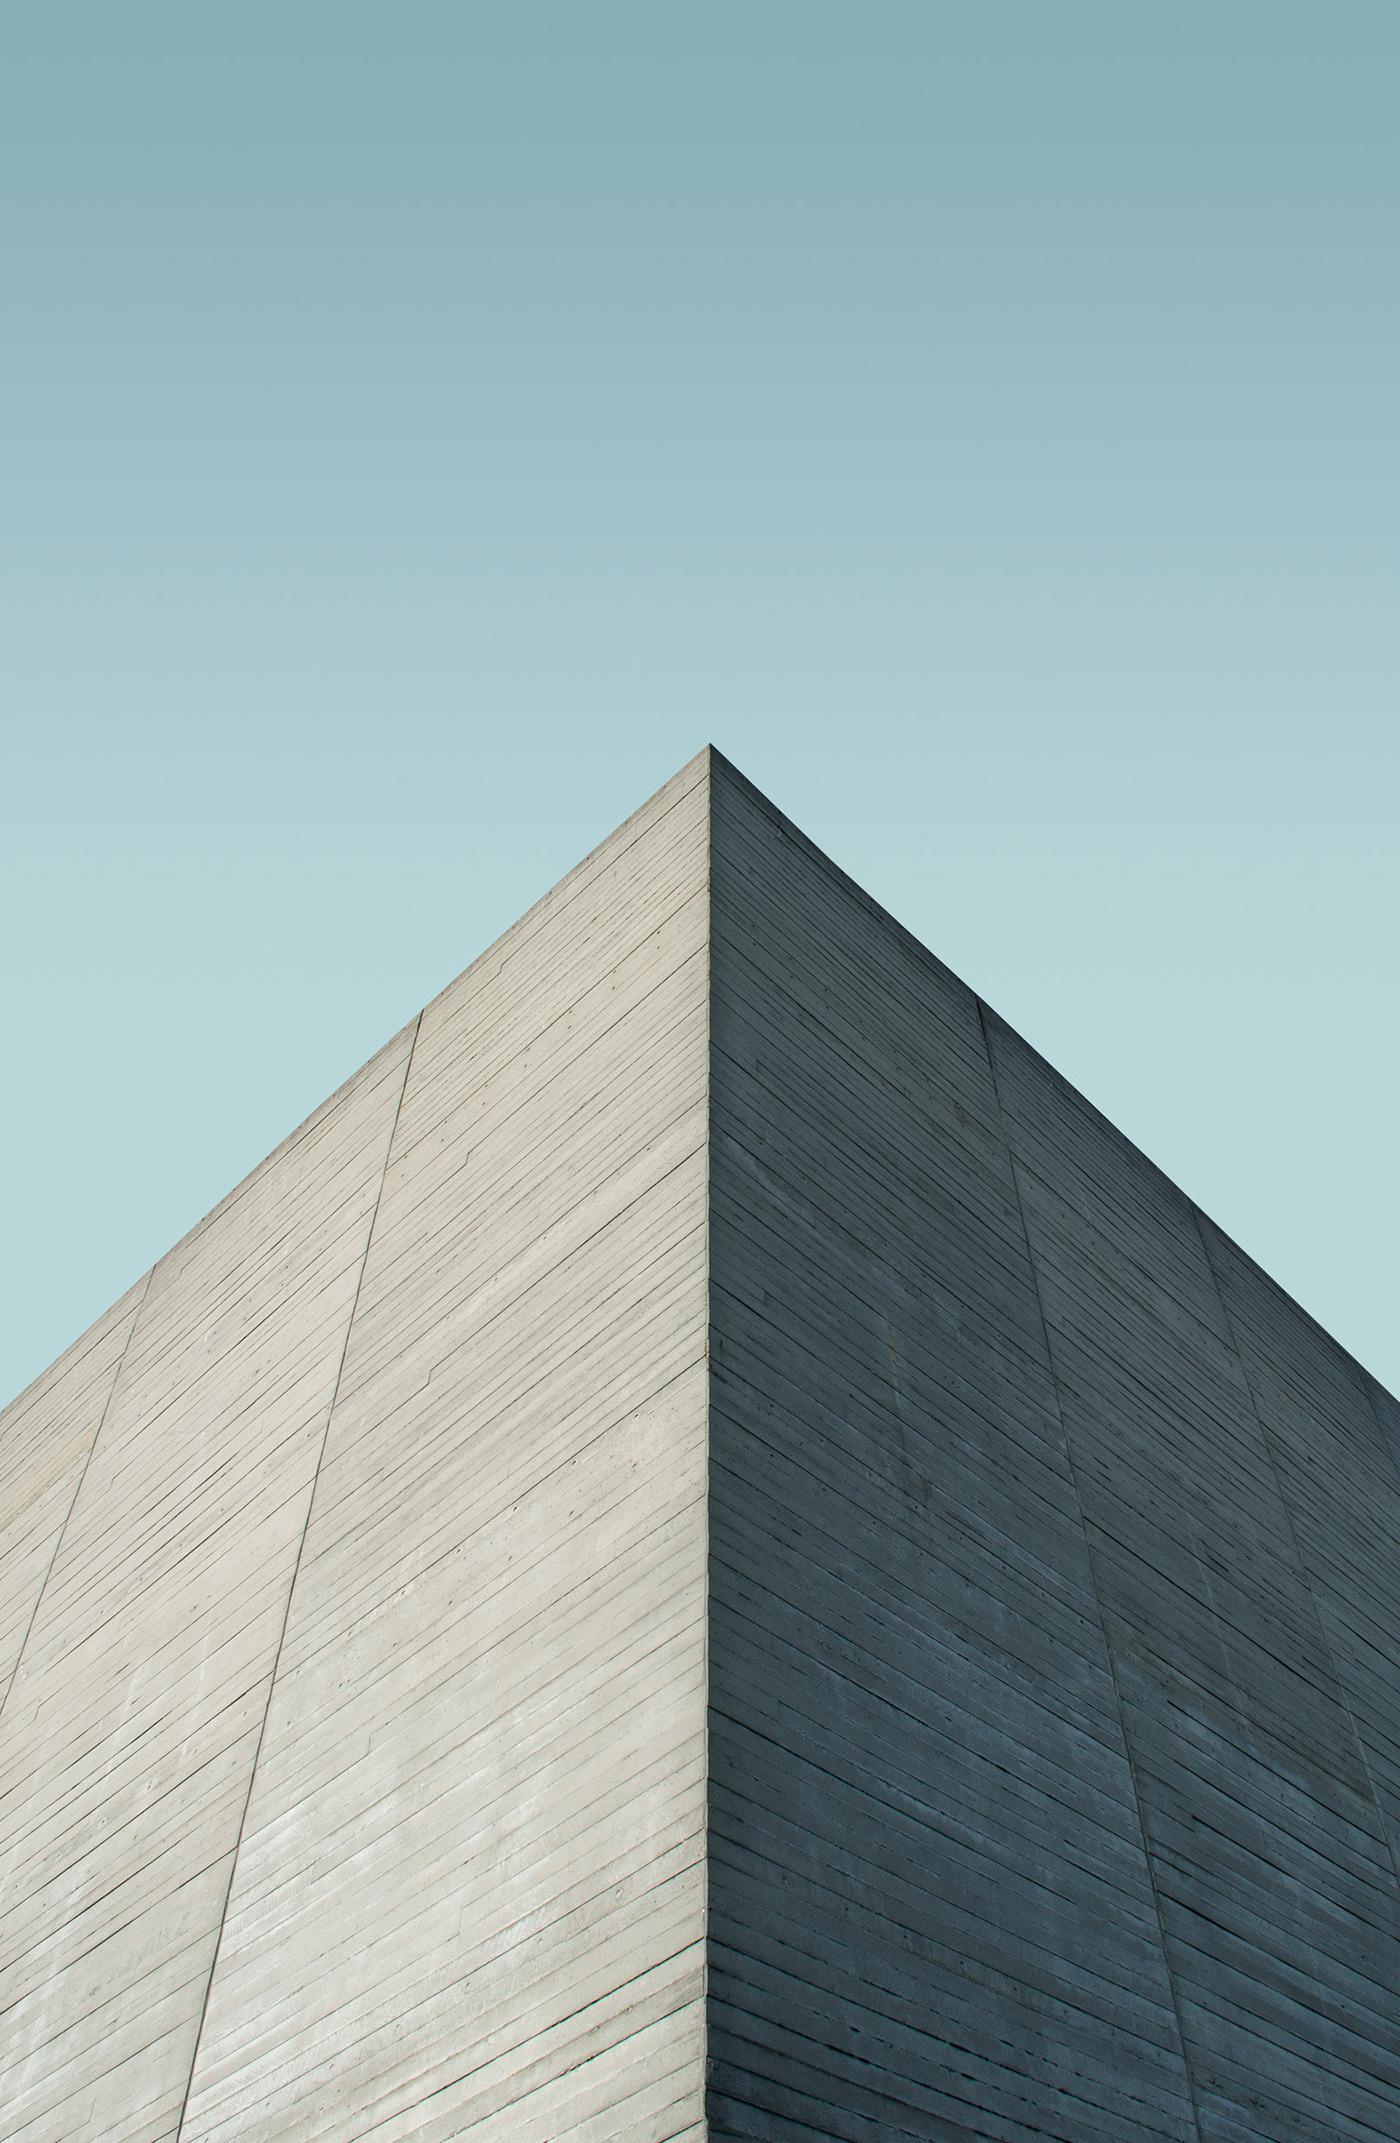 minimal Minimalism pastel modern architecture London building pattern geometry Urban skyscraper